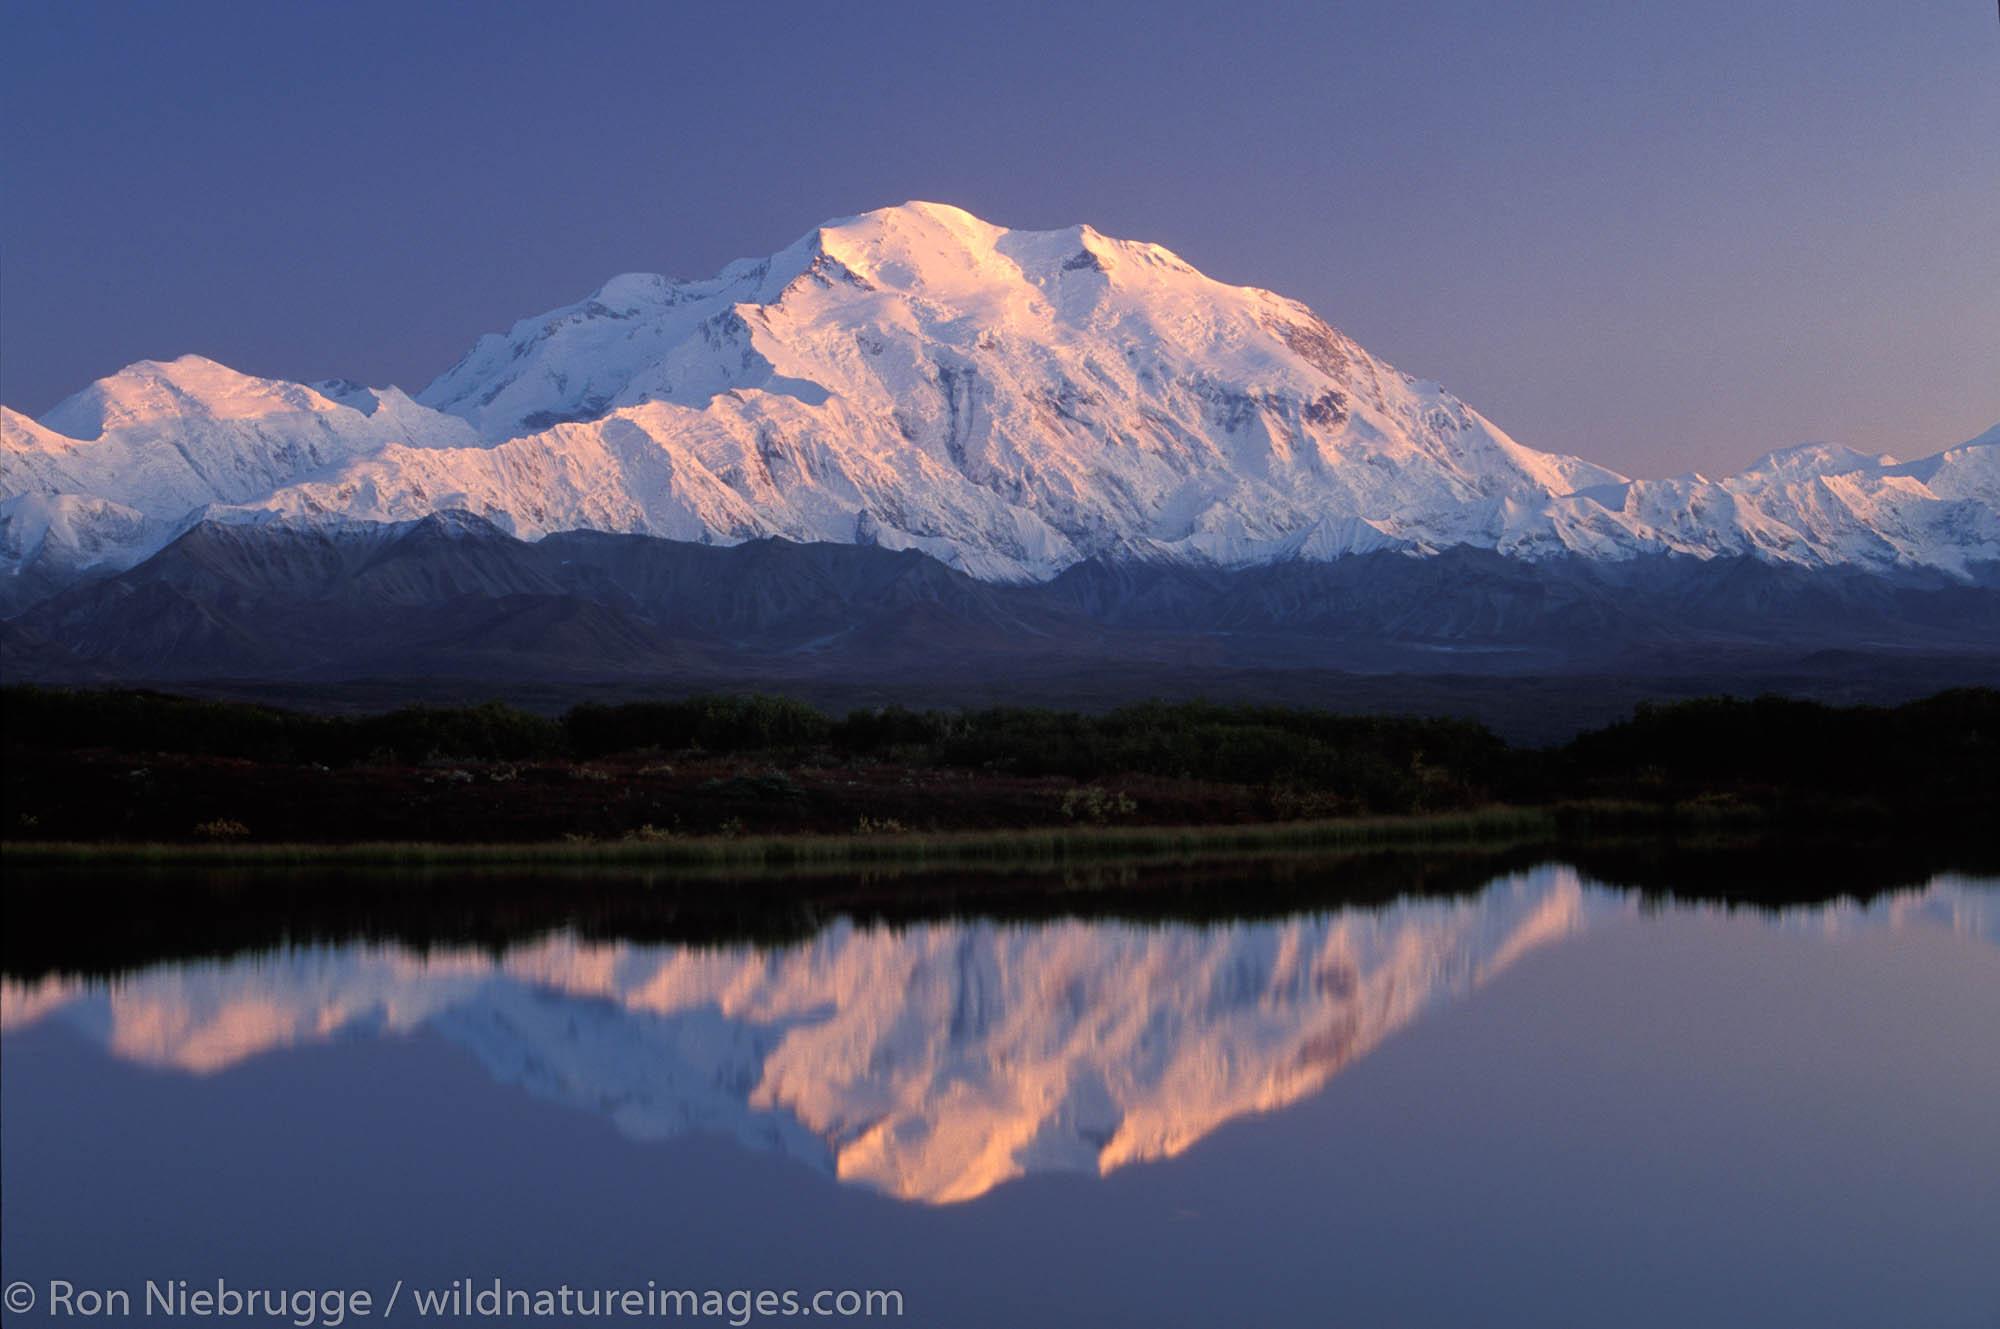 Mt McKinley and Reflection Pond, Denali National Park, Alaska.